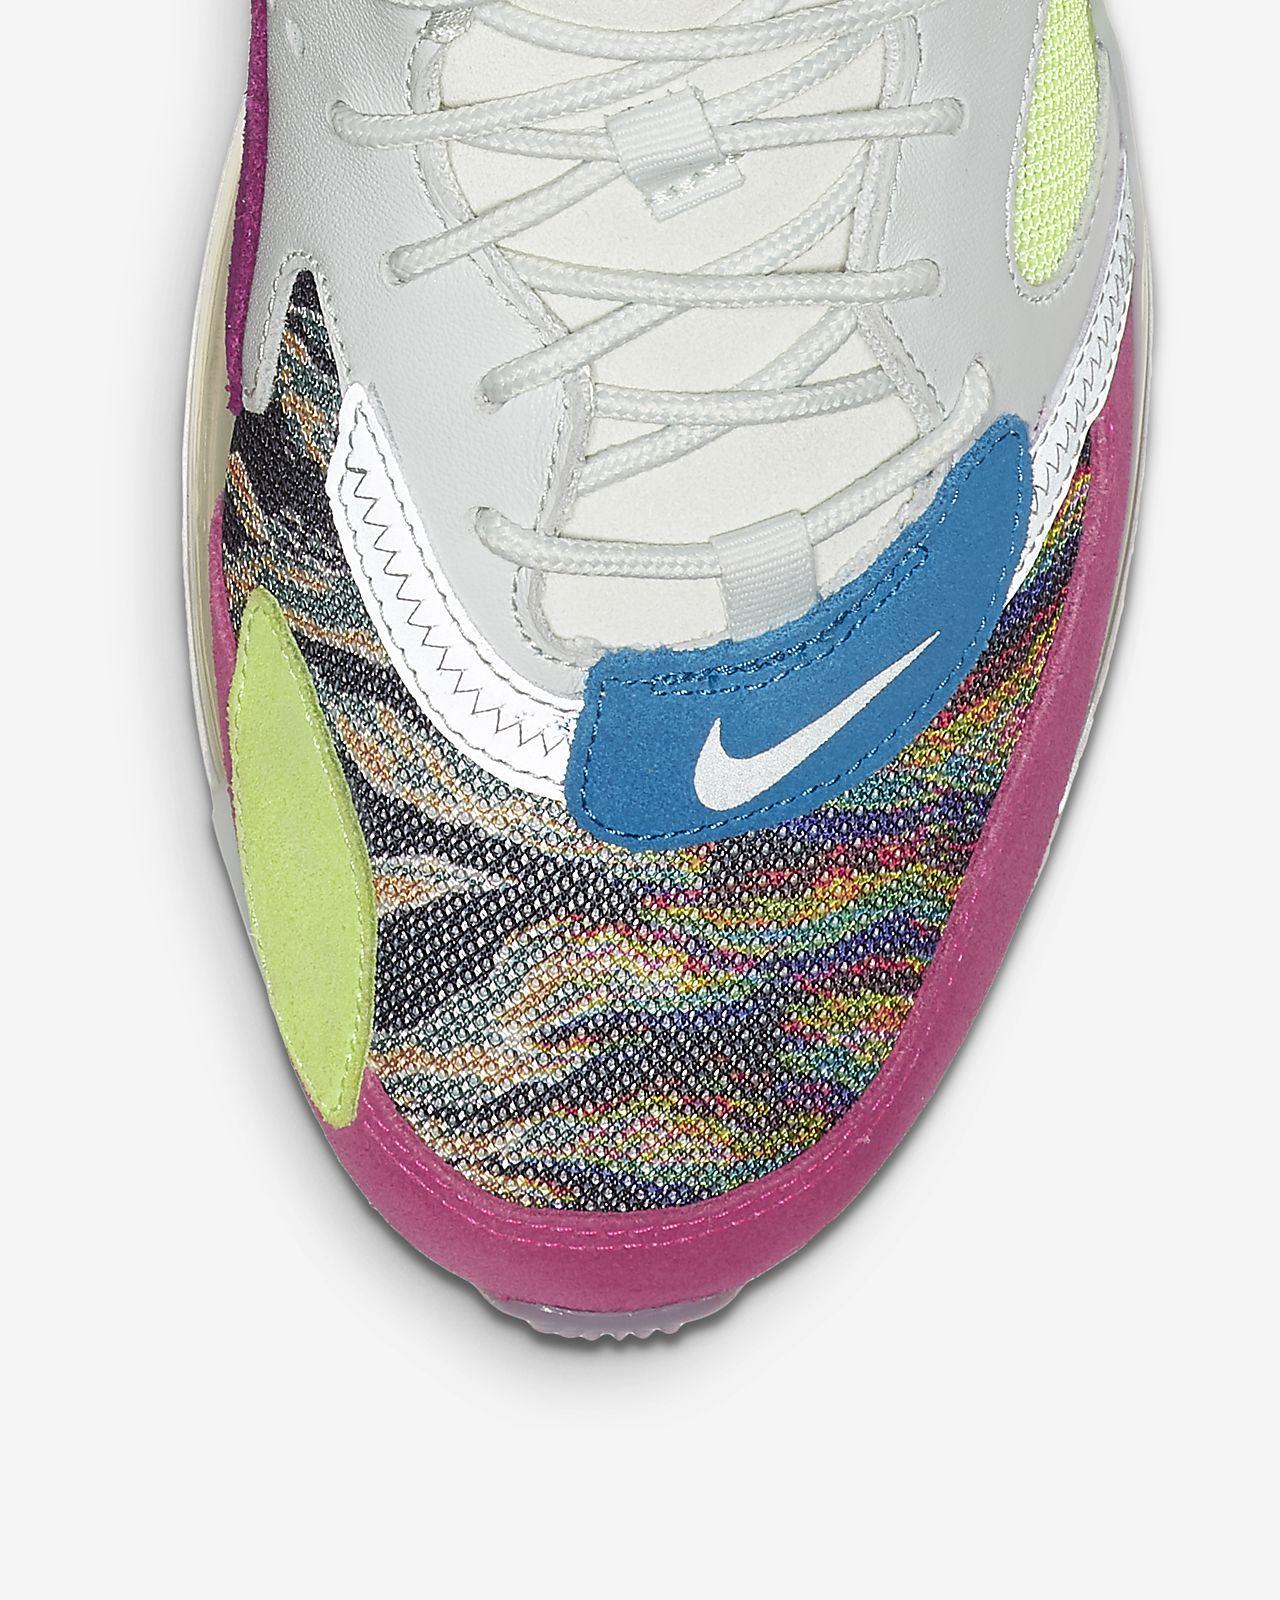 Nike Air Max 720 (OBJ) Men's Running Shoe